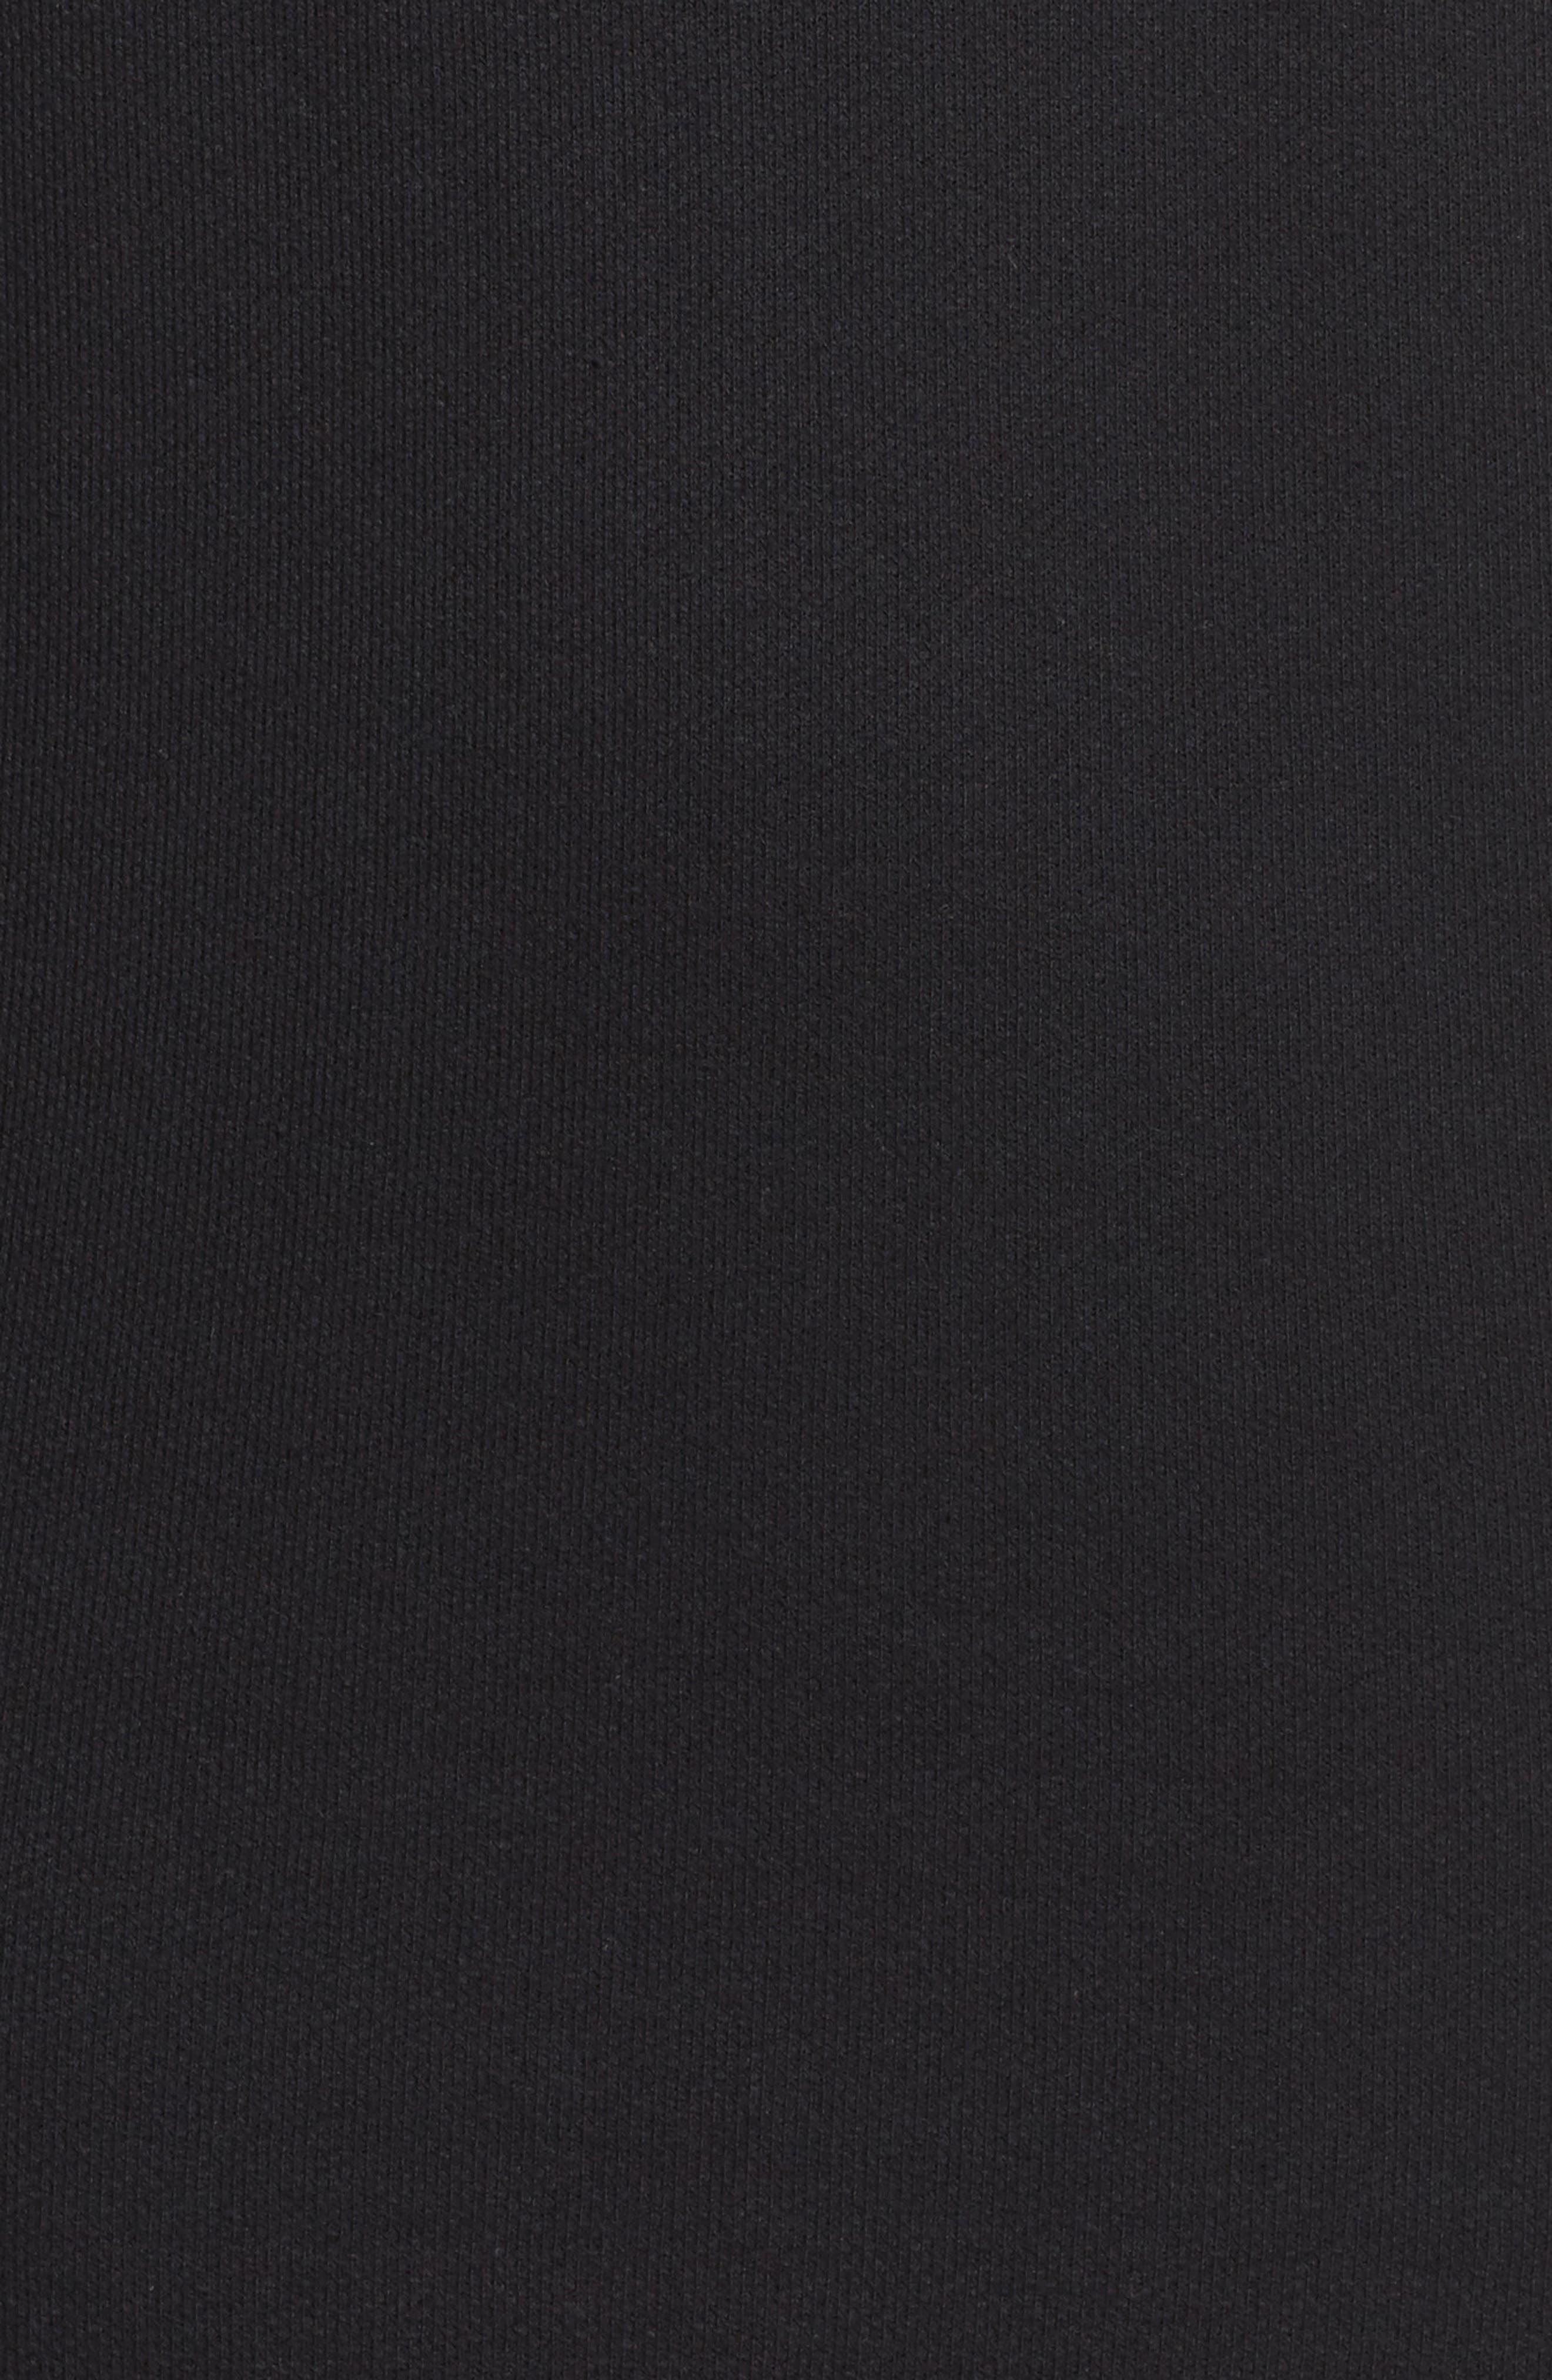 FILA,                             Courtney Sweatshirt Dress,                             Alternate thumbnail 6, color,                             001